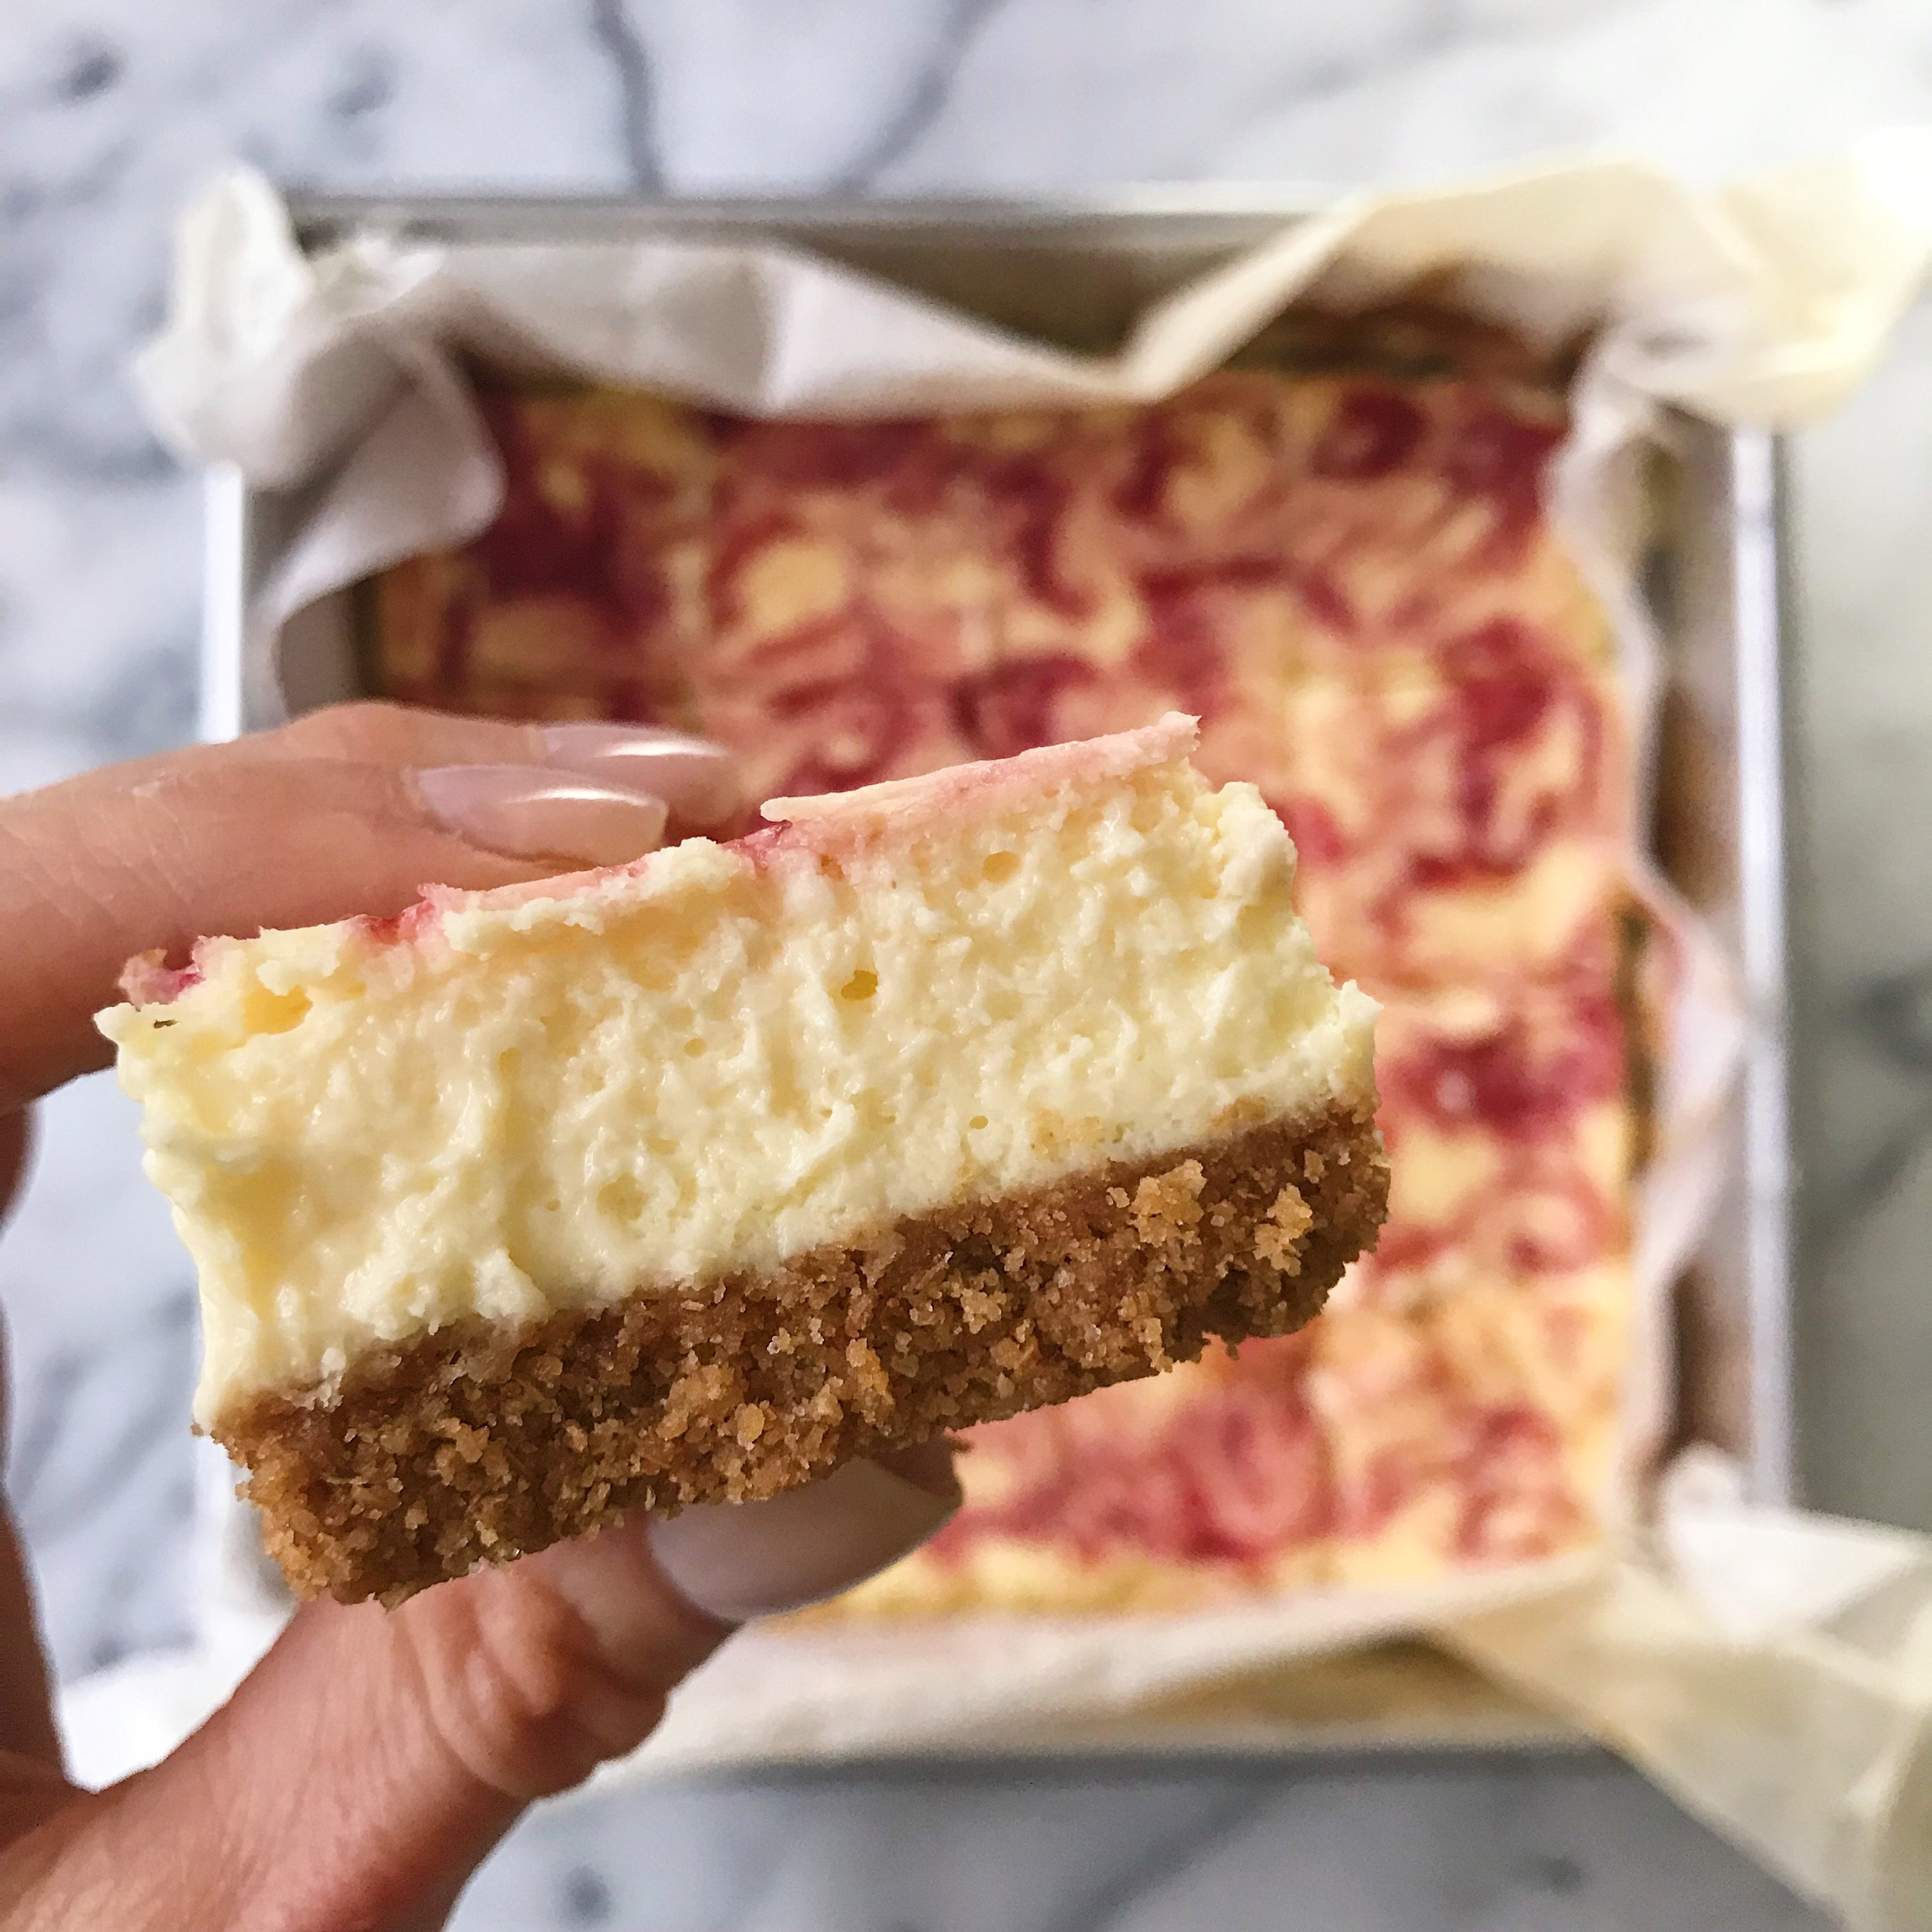 Lemony Cheesecake squares raspberry swirl gluten free #glutenfreerecipes www.healthygffamily.com